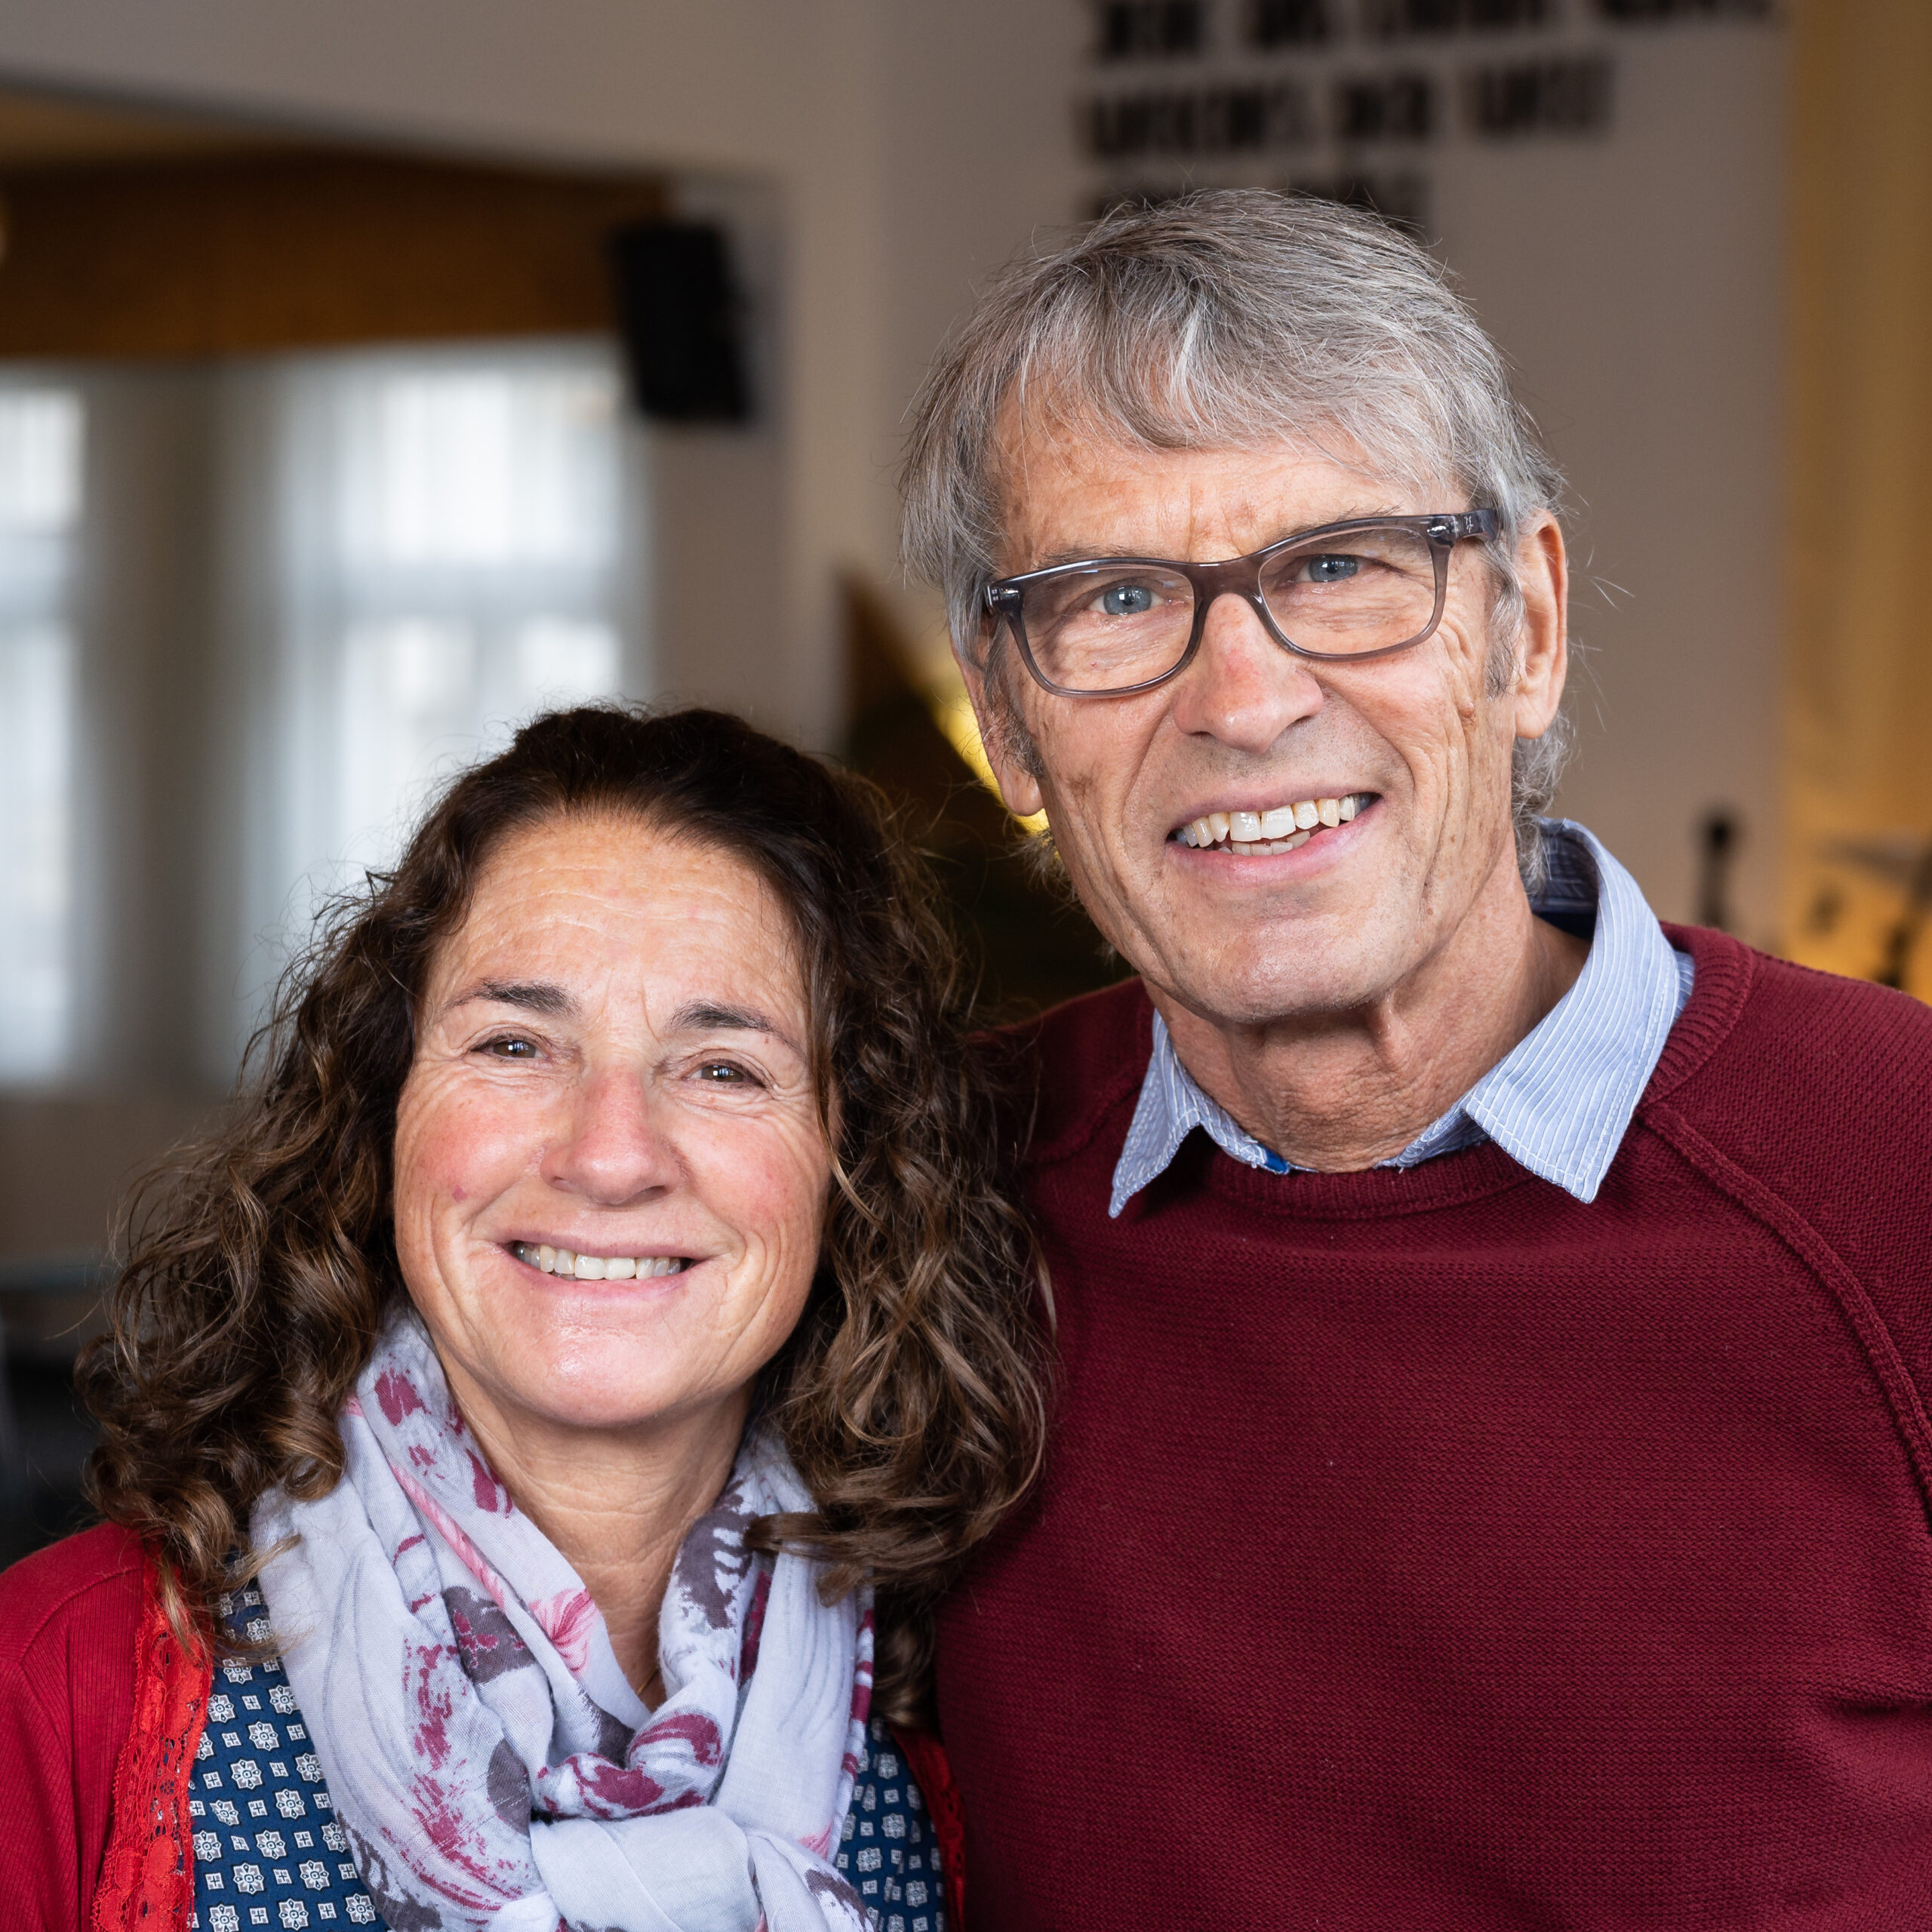 Hans & Sonja Eugster